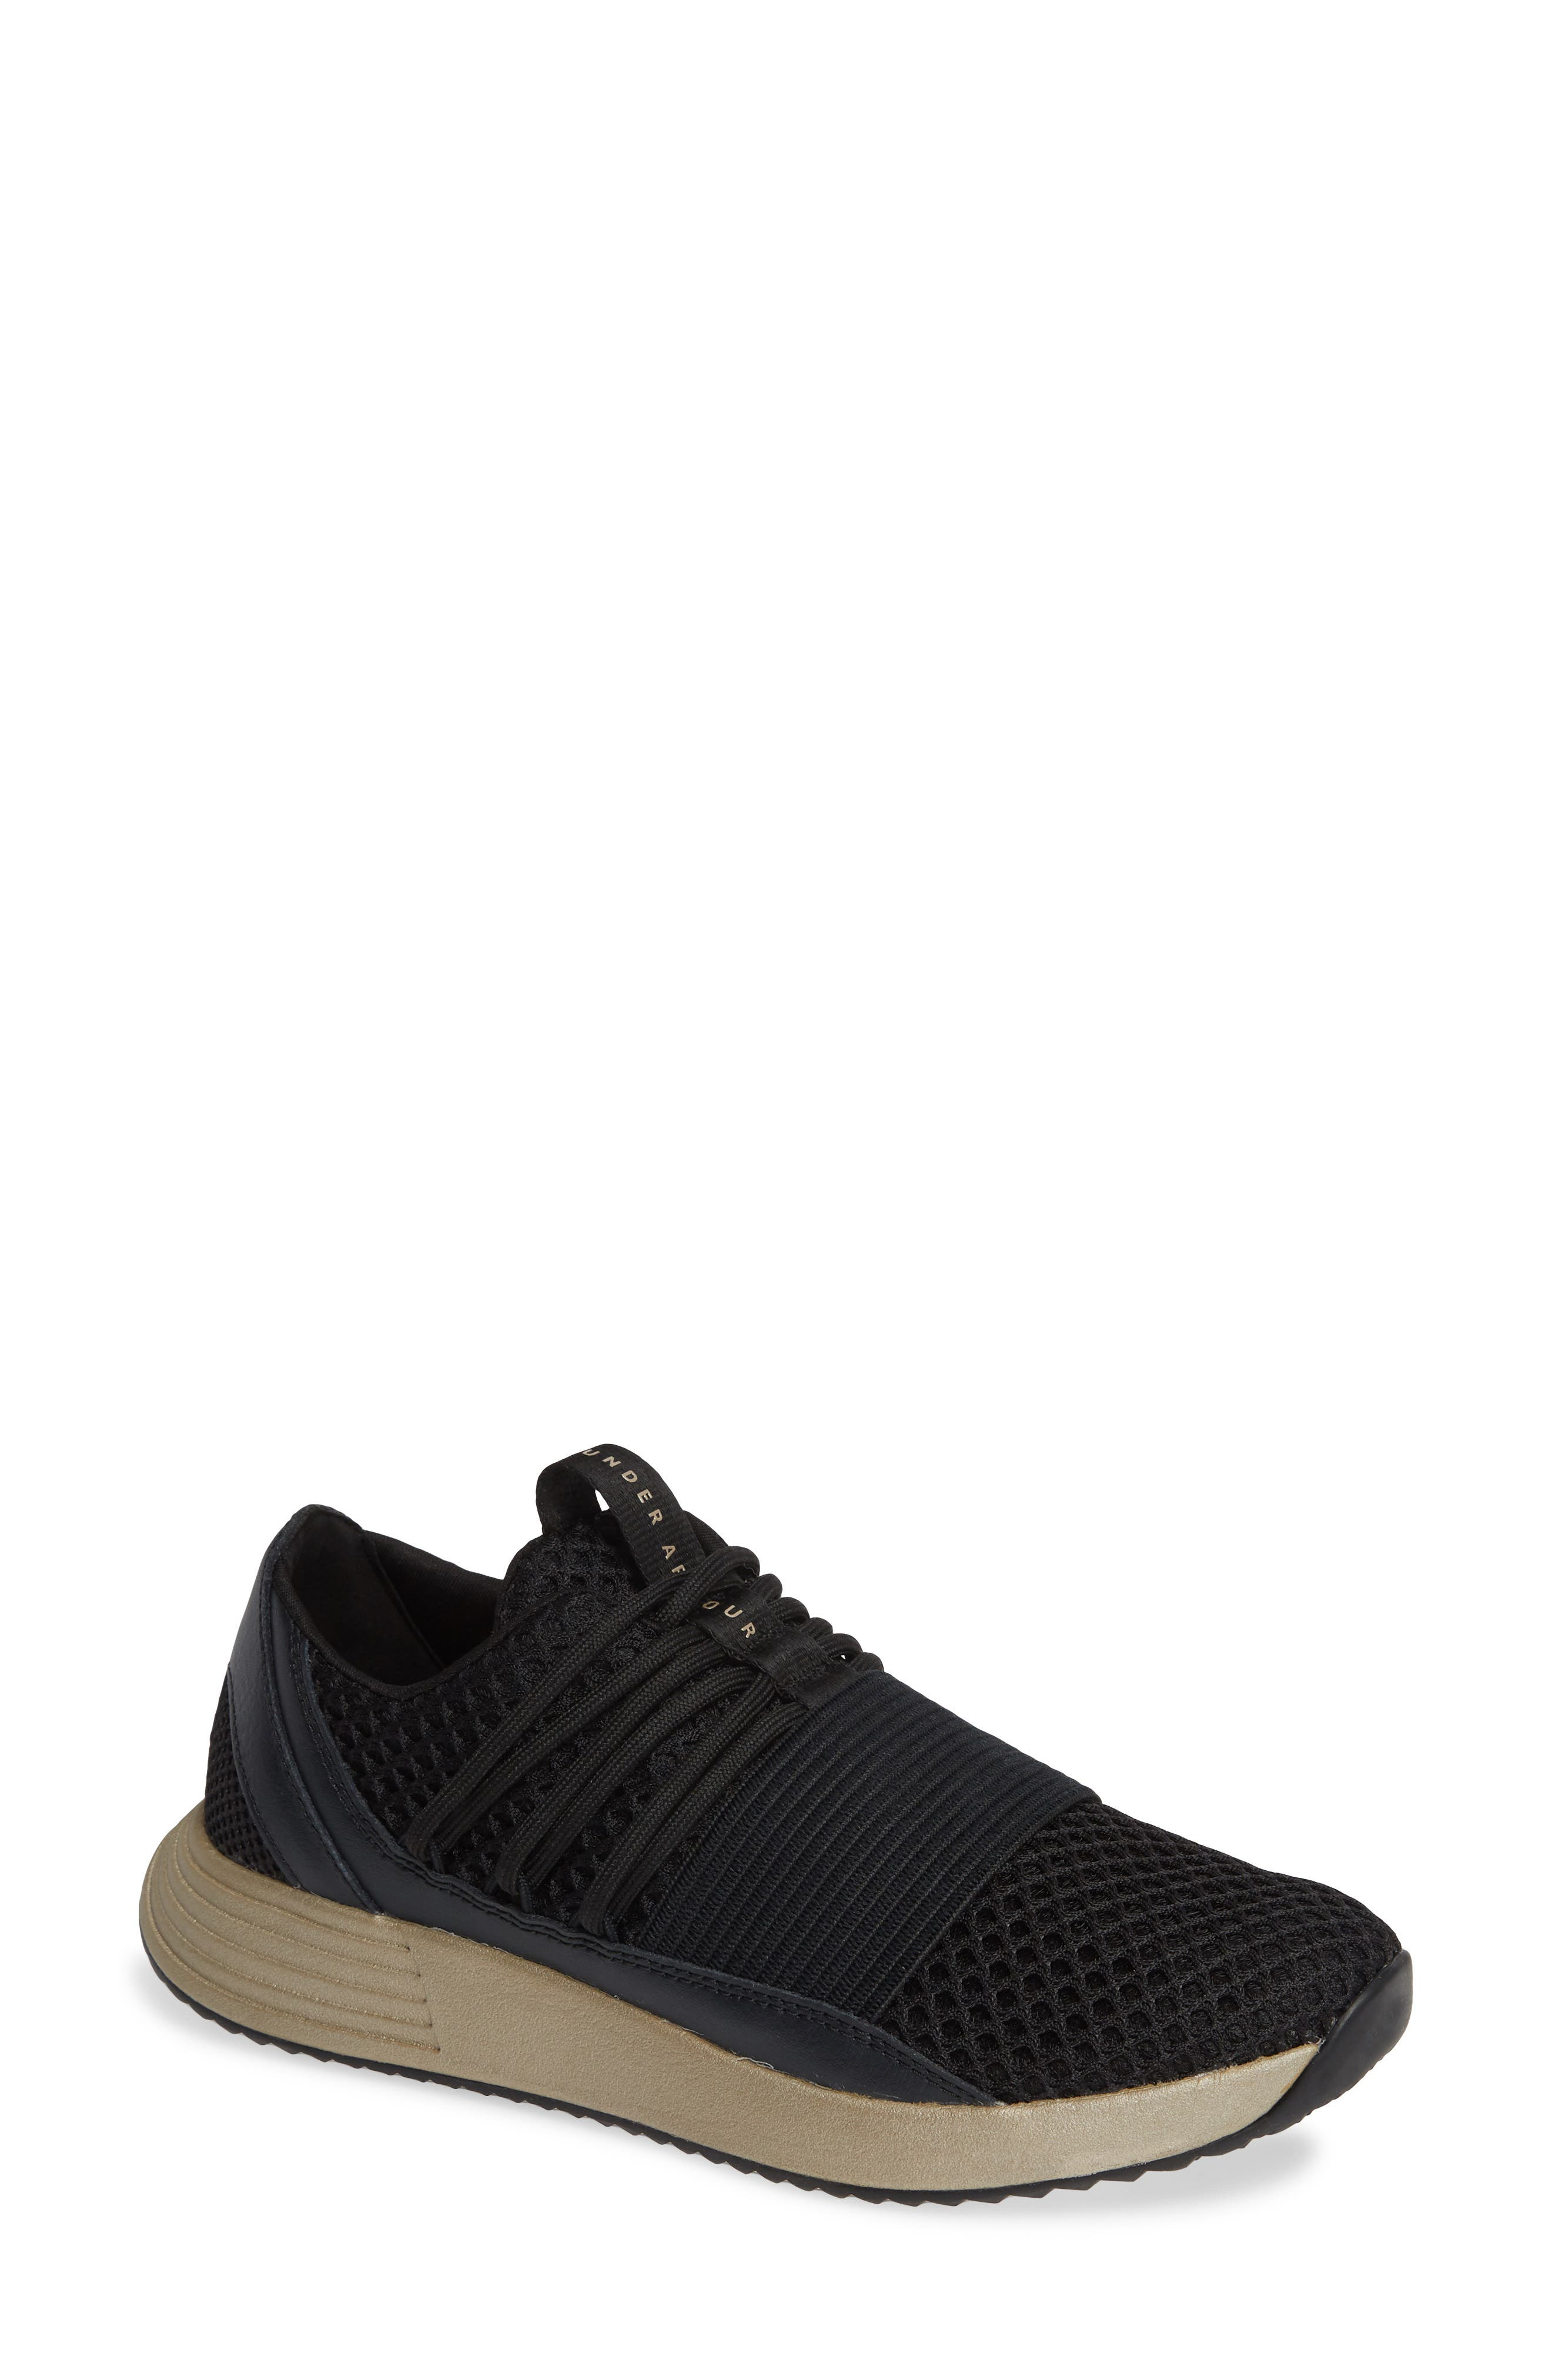 Breathe Lace X NM Sneaker,                             Main thumbnail 1, color,                             BLACK/ METALLIC FADED GOLD